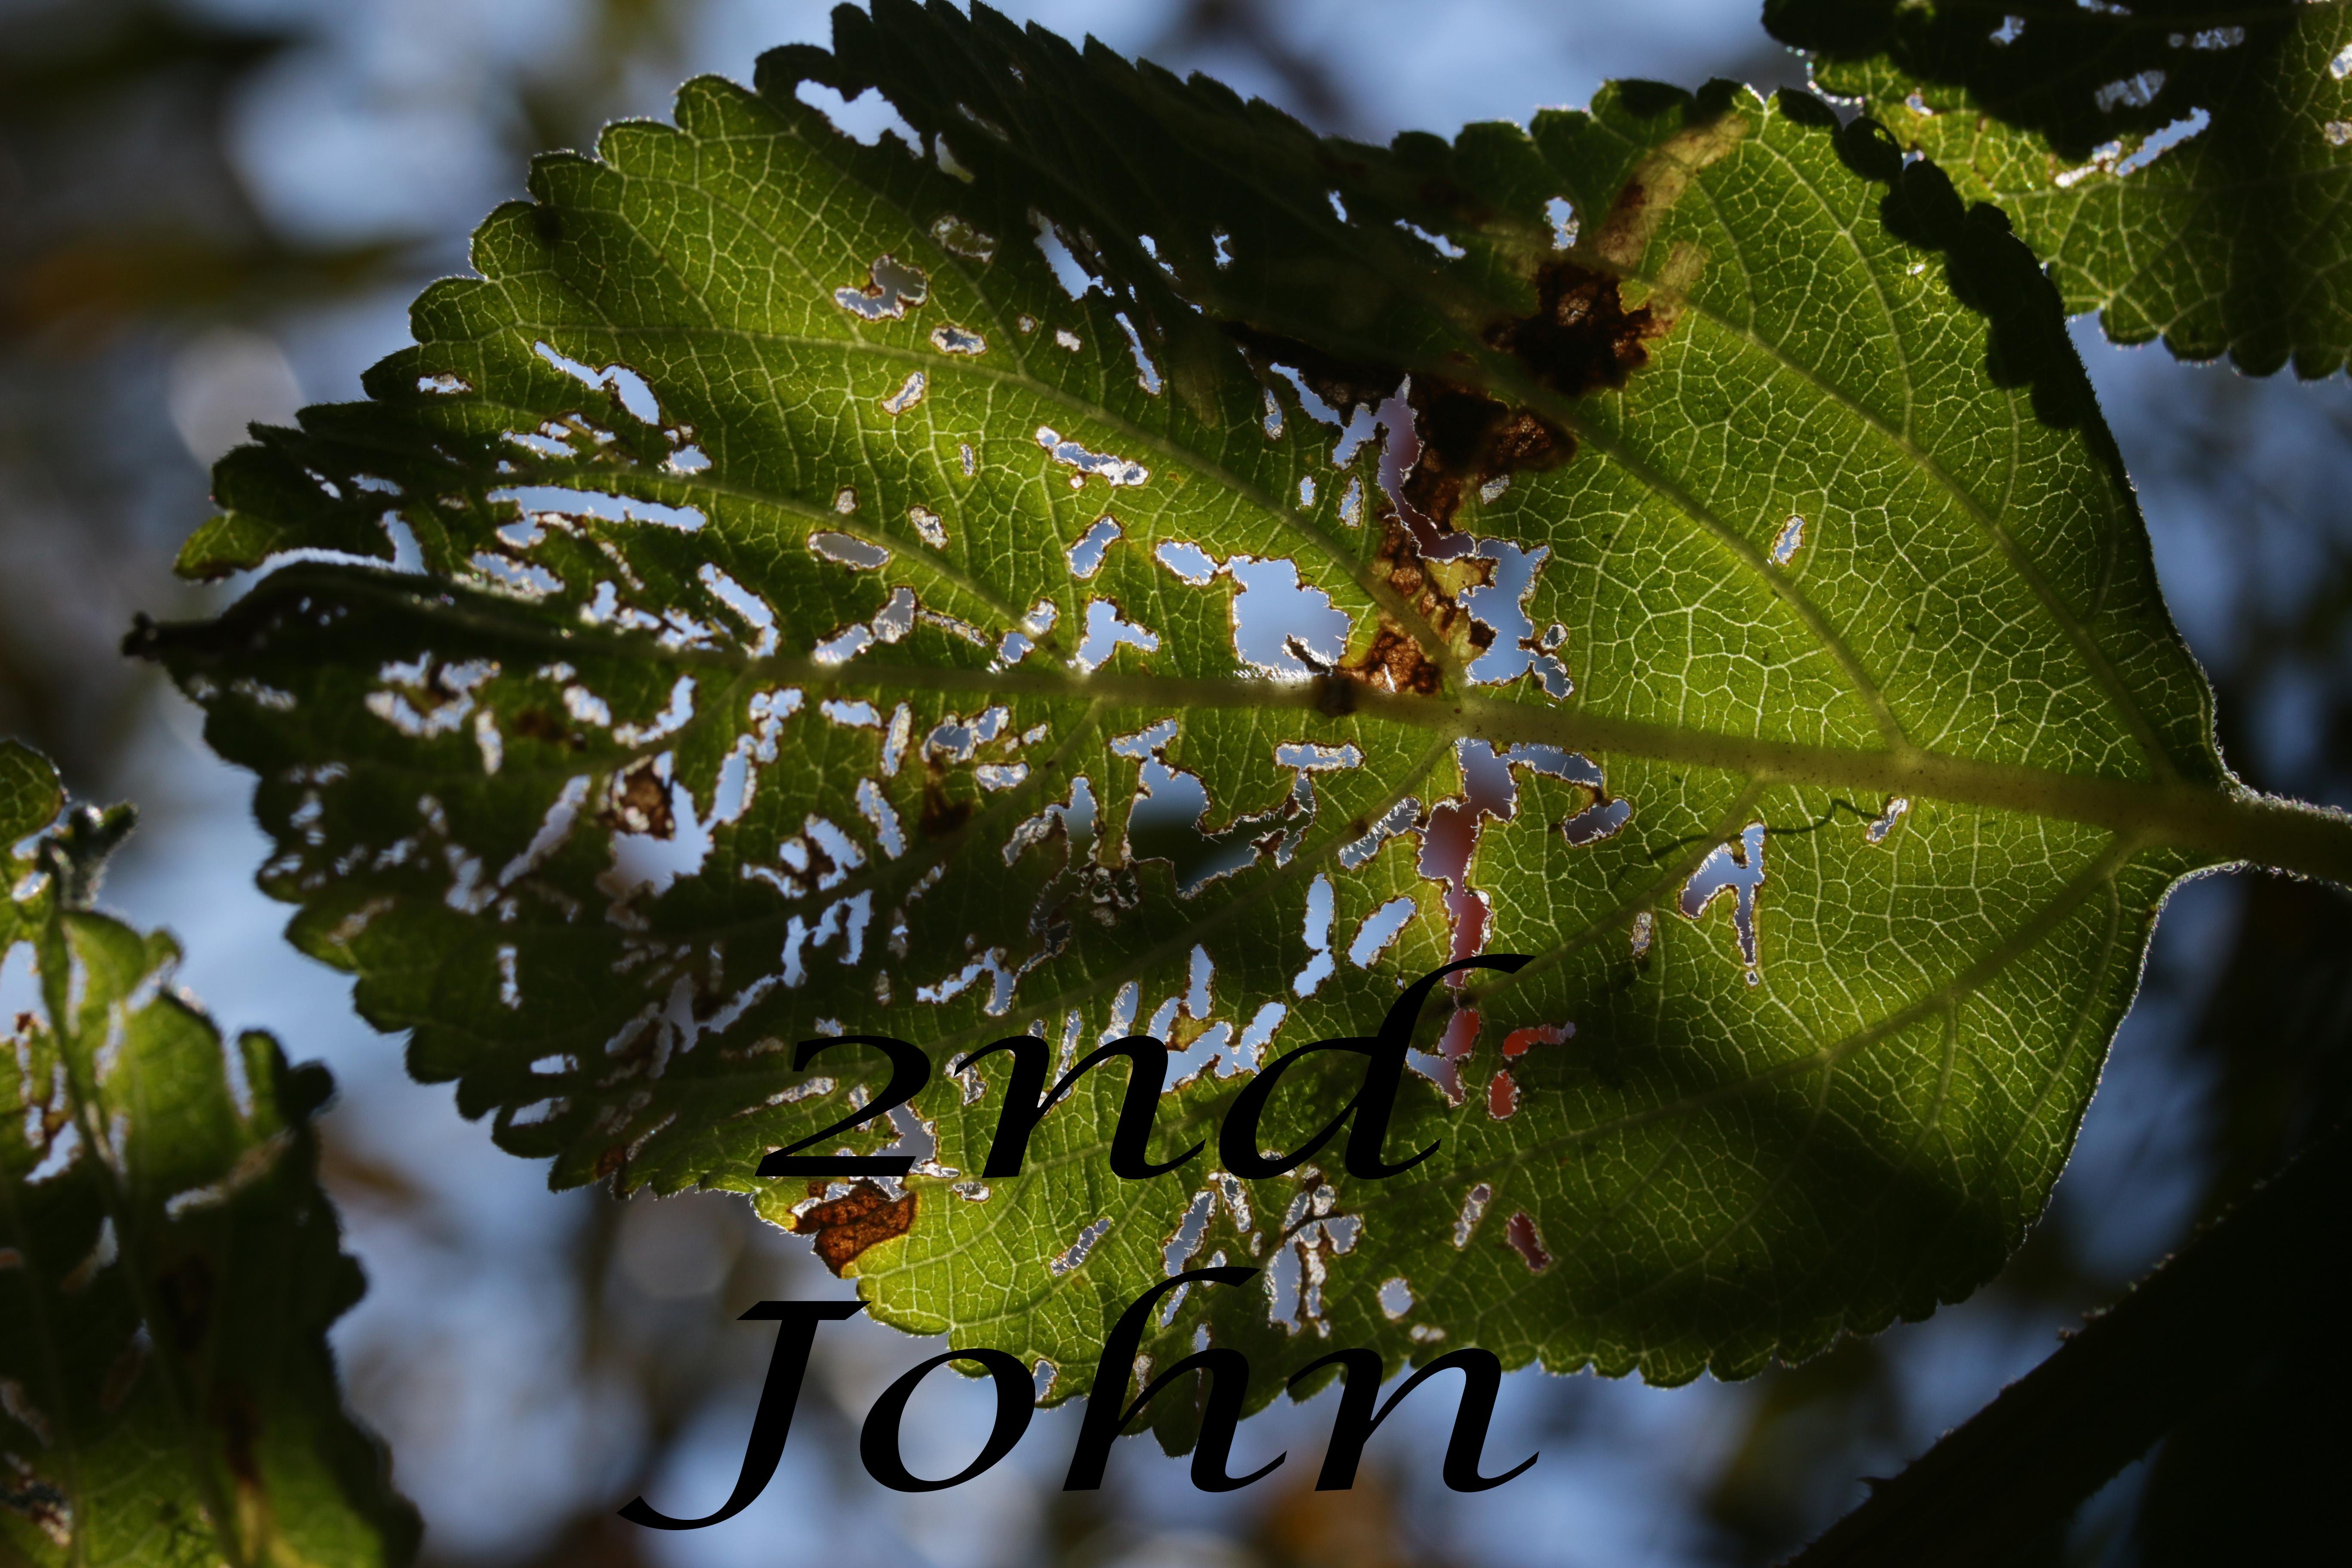 2nd John Abbott